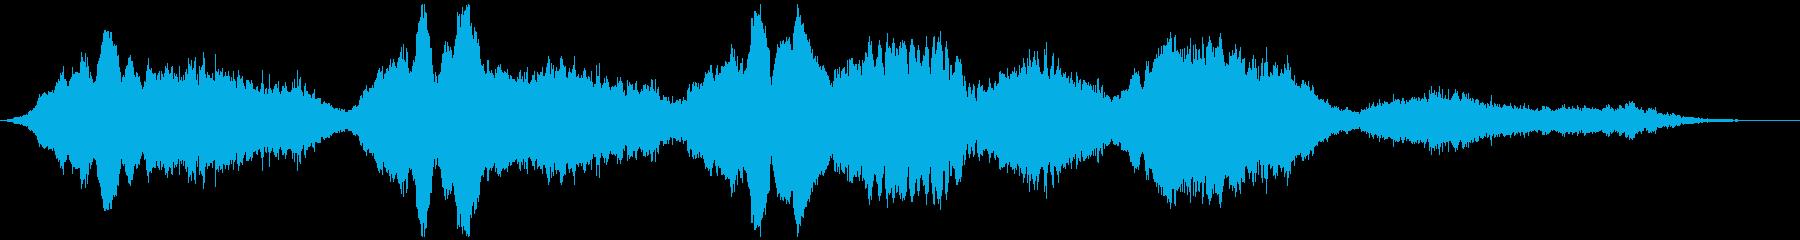 PADS 不気味なメロディー01の再生済みの波形